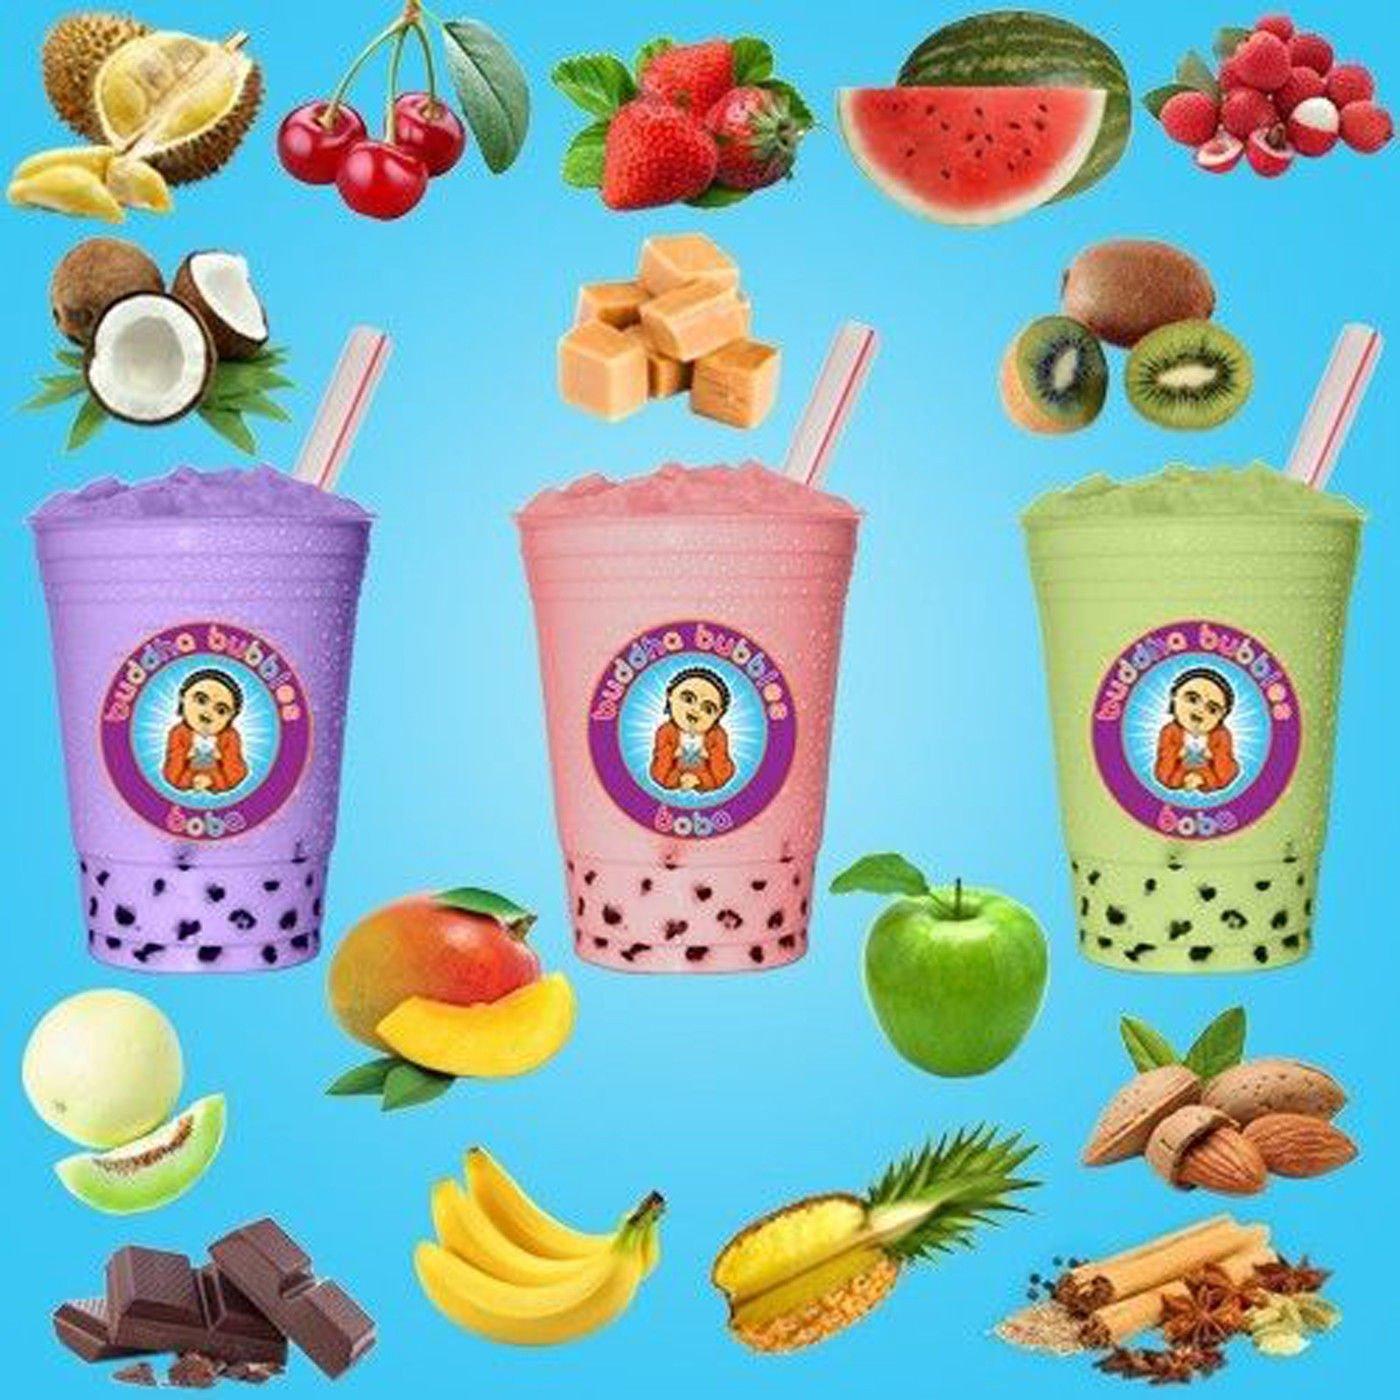 10+ Drinks Pineapple Boba Tea Kit: Tea Powder, Tapioca Pearls & Straws By Buddha Bubbles Boba by Buddha Bubbles Boba